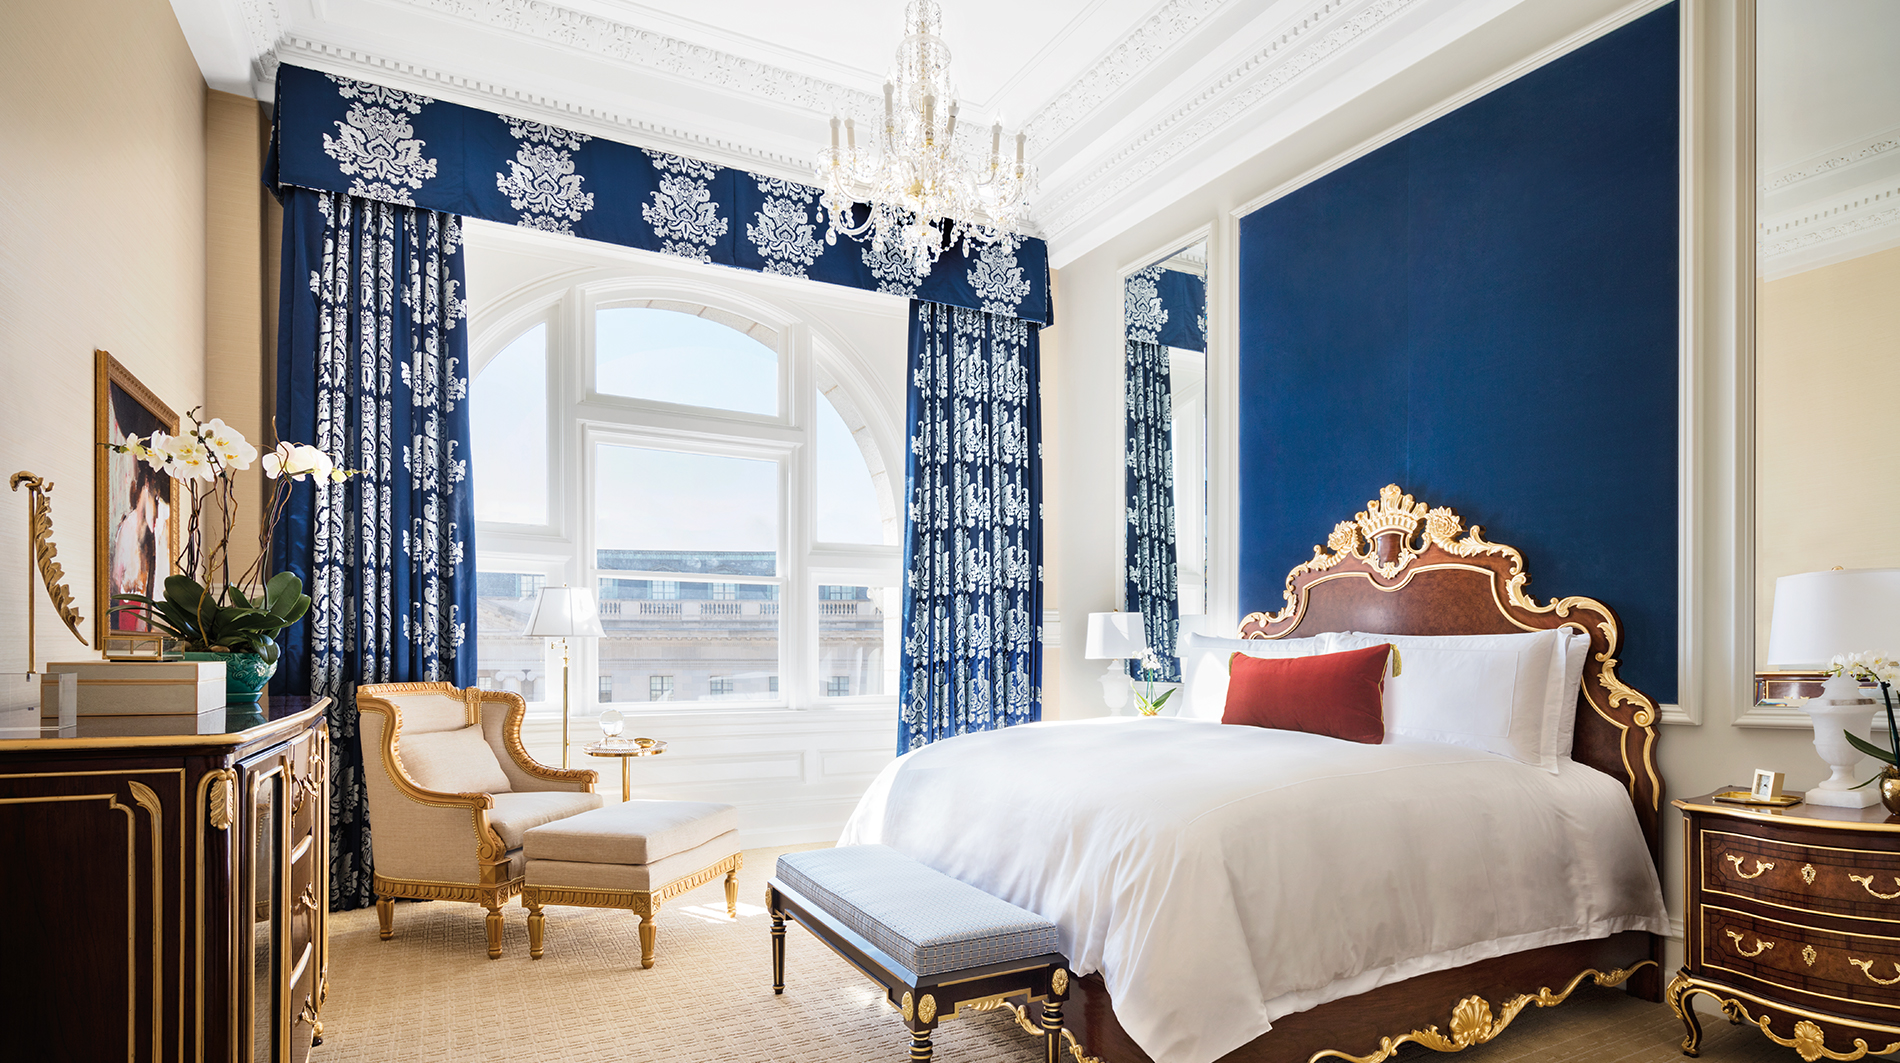 Trump international hotel washington dc Benjamin guest room